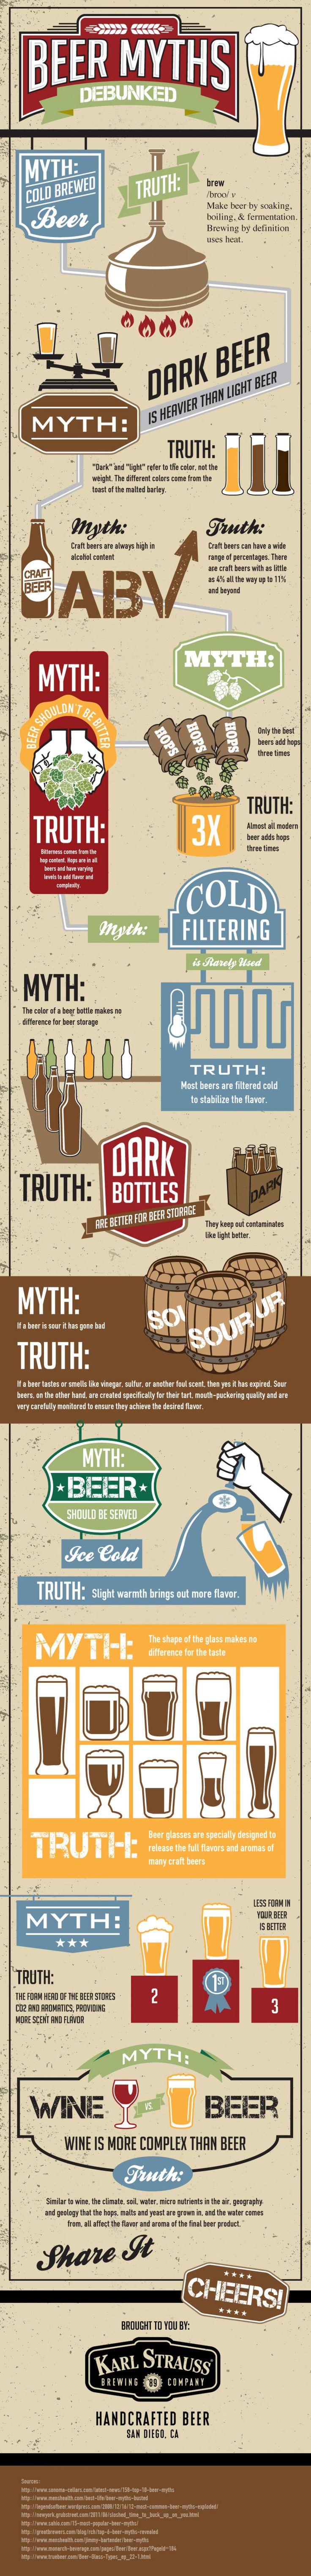 #Beer #Myths Debunked Infographic